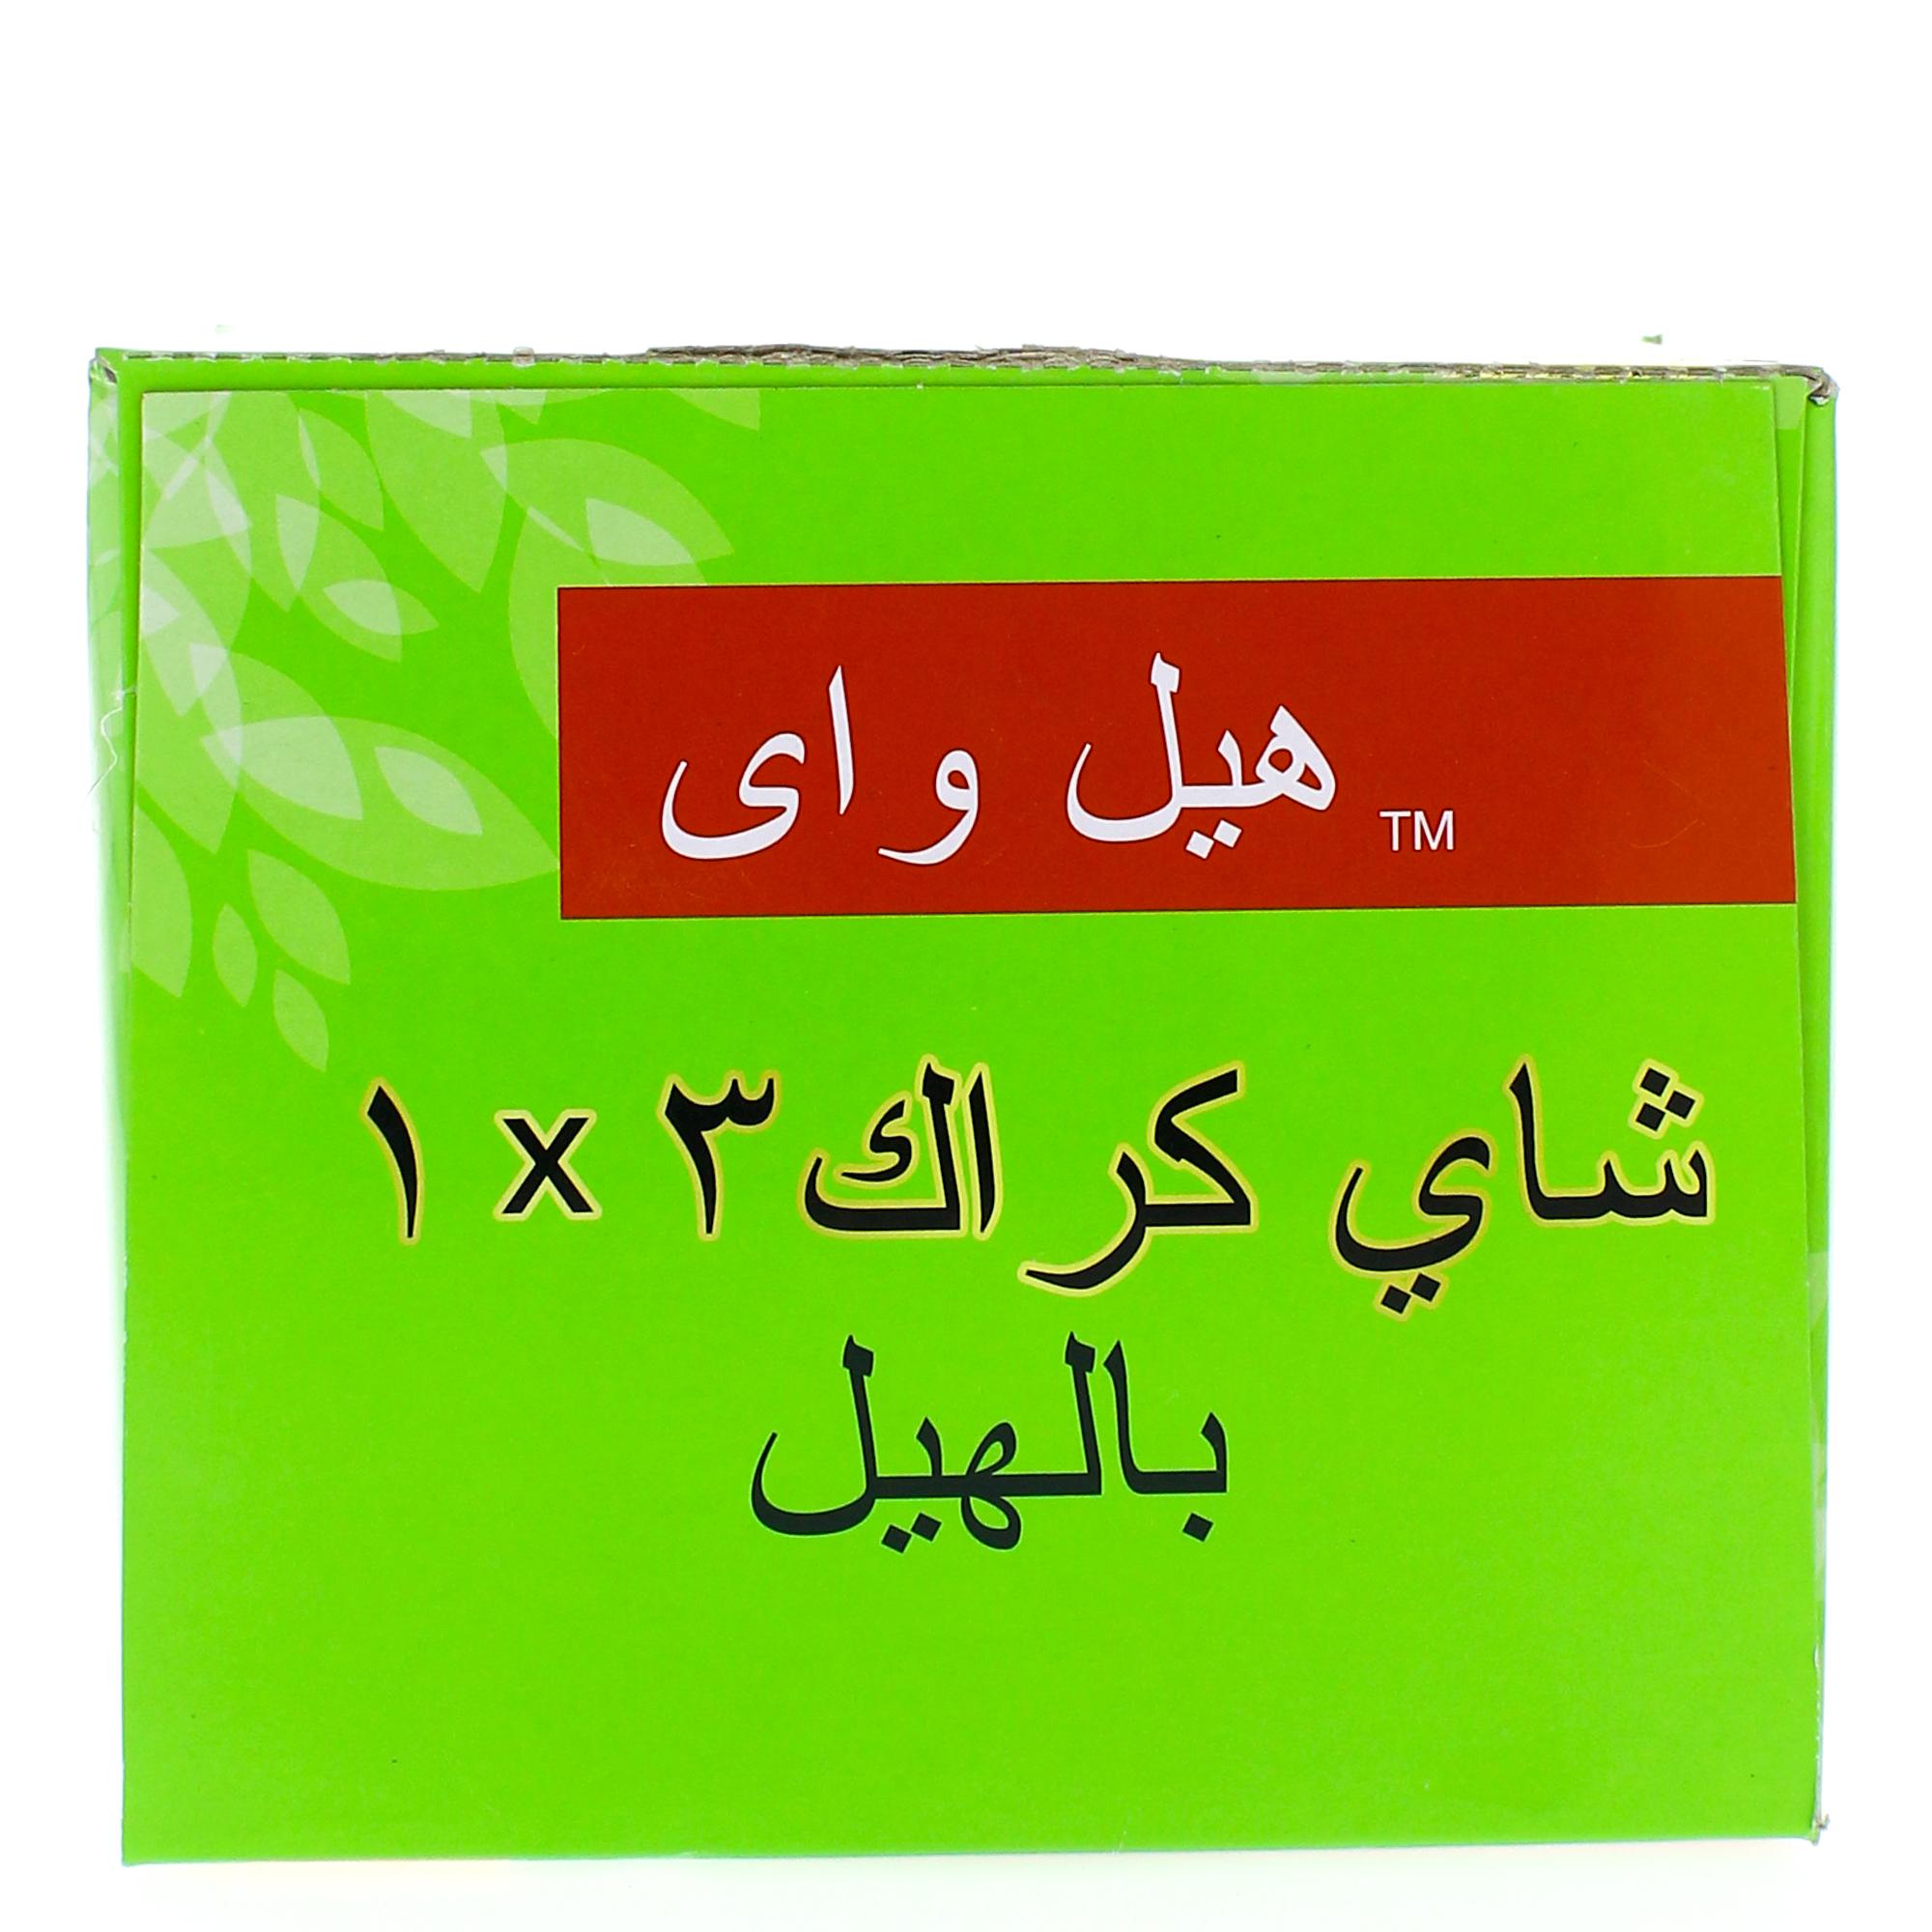 Nana نعناع - كرتون شاي هيل واي كرك بالهيل 18 جرام × 24